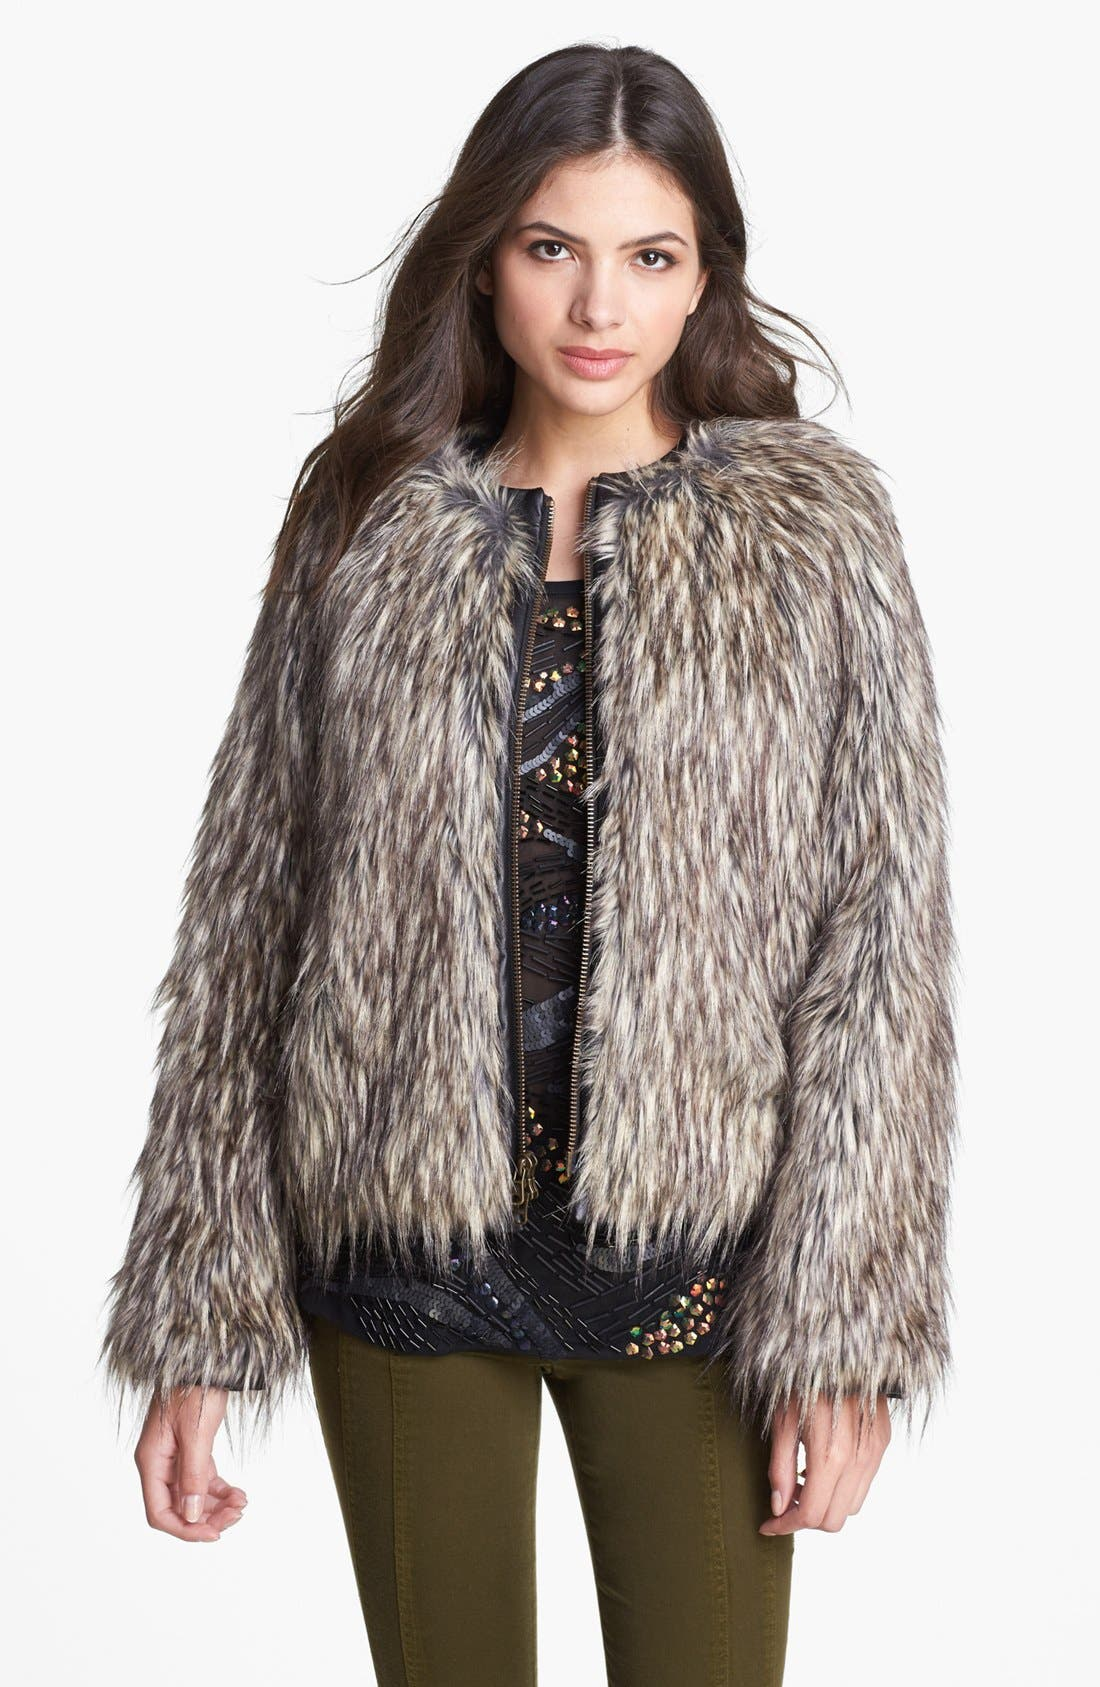 Alternate Image 1 Selected - Nanette Lepore 'Vagabond' Faux Fur Jacket